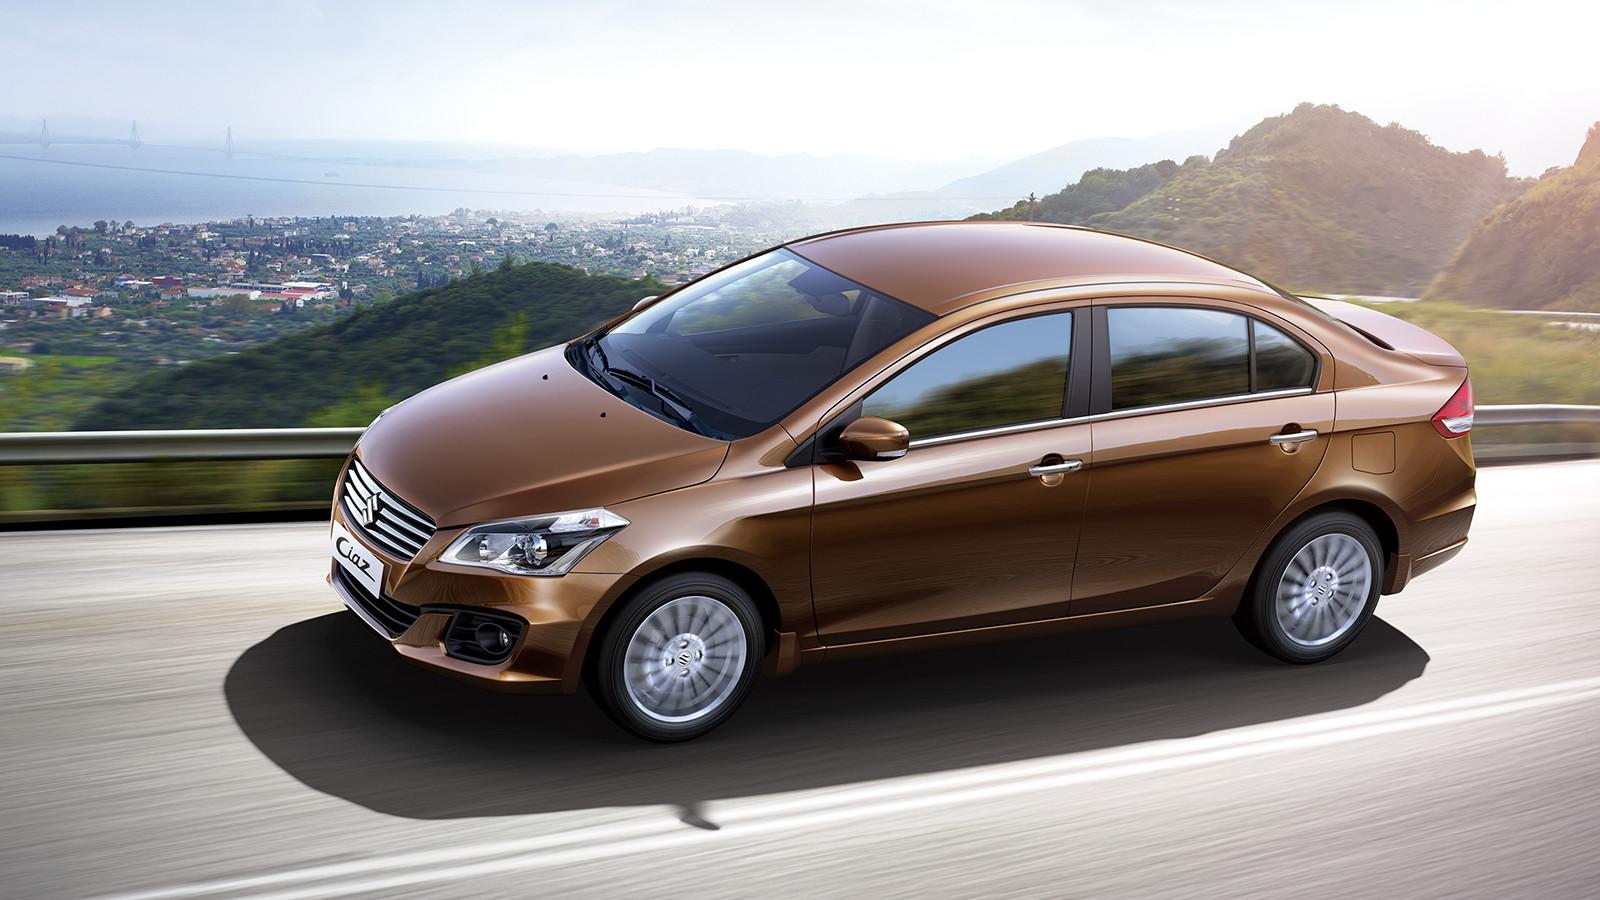 Suzuki Ciaz 2017 Standard In Uae New Car Prices Specs Reviews Amp Photos Yallamotor